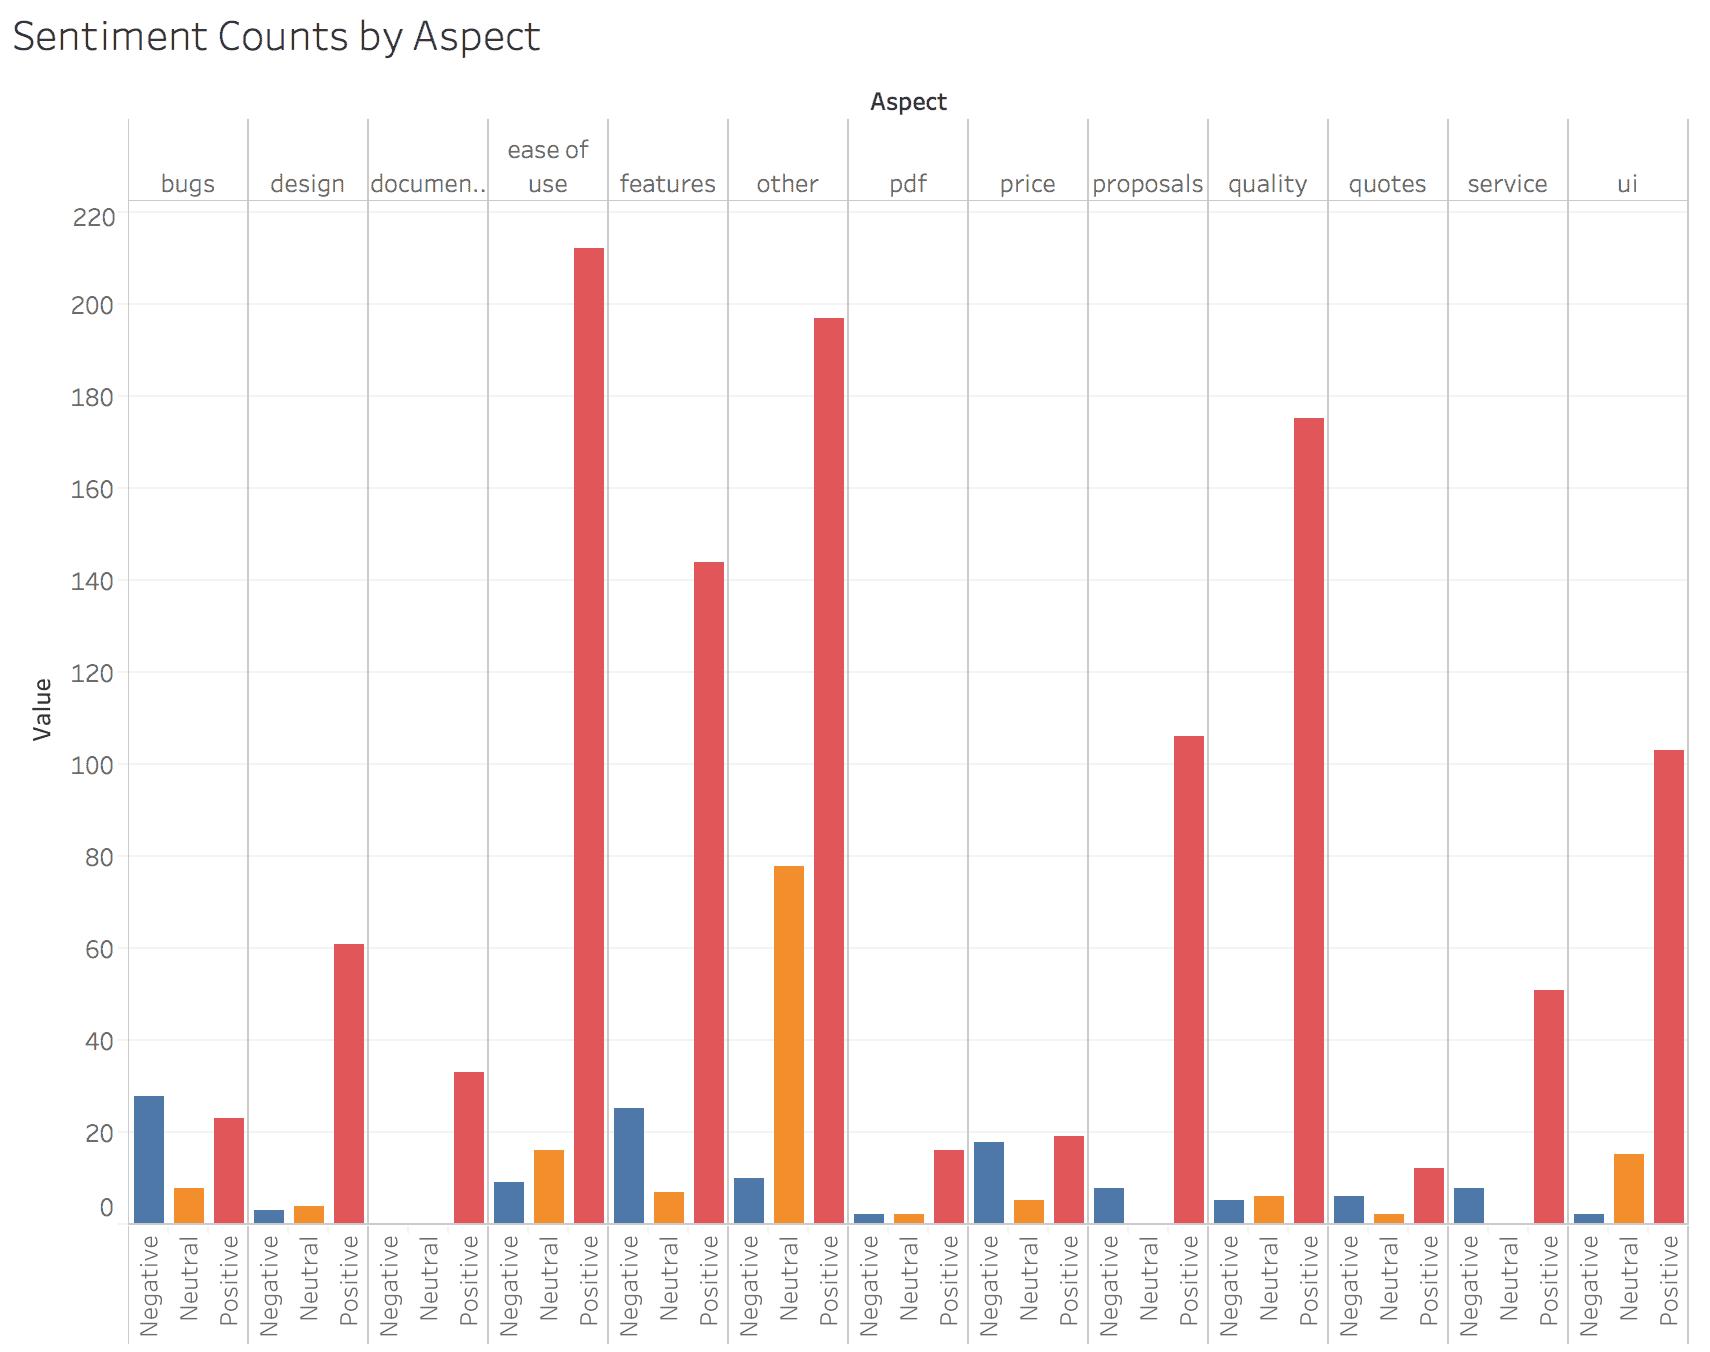 Tableau Sentiment Counts by Aspect vertical bar chart.